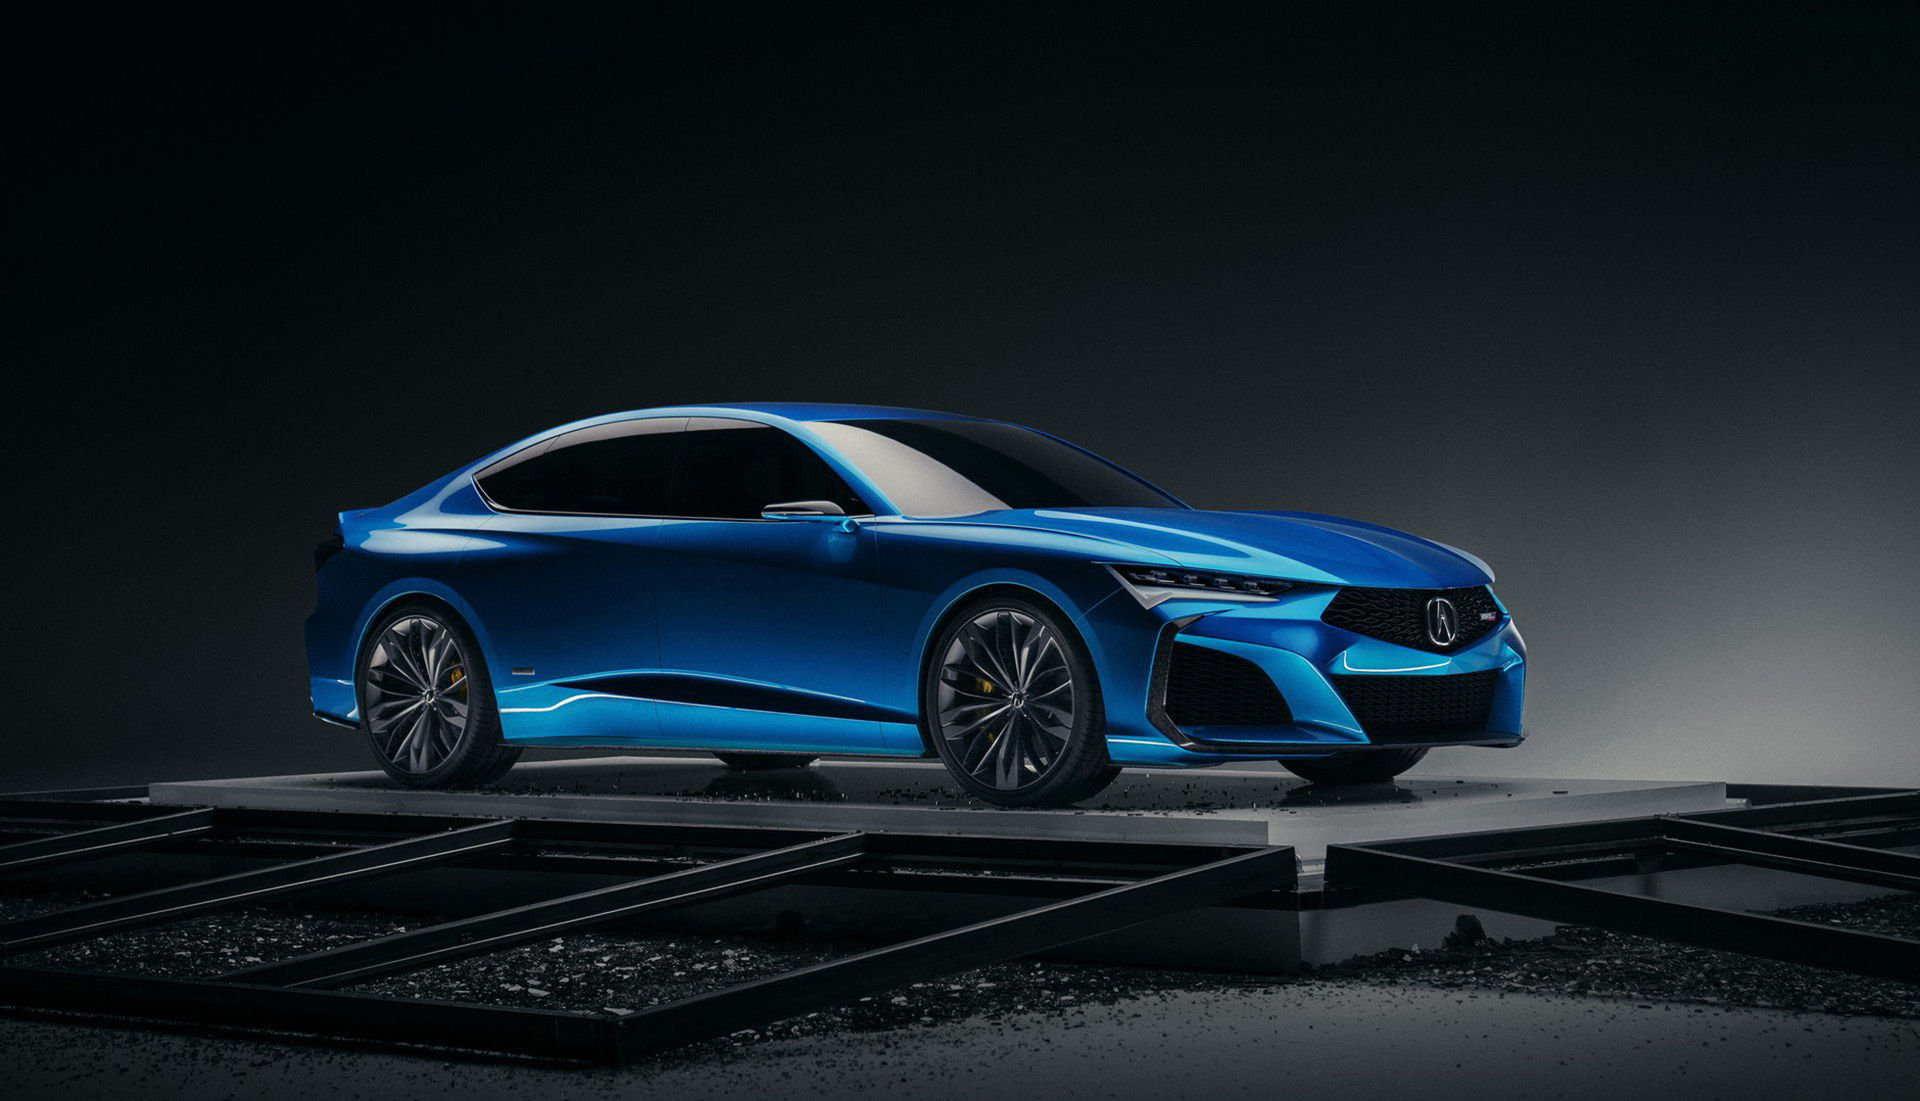 Acura visar konceptet Type S